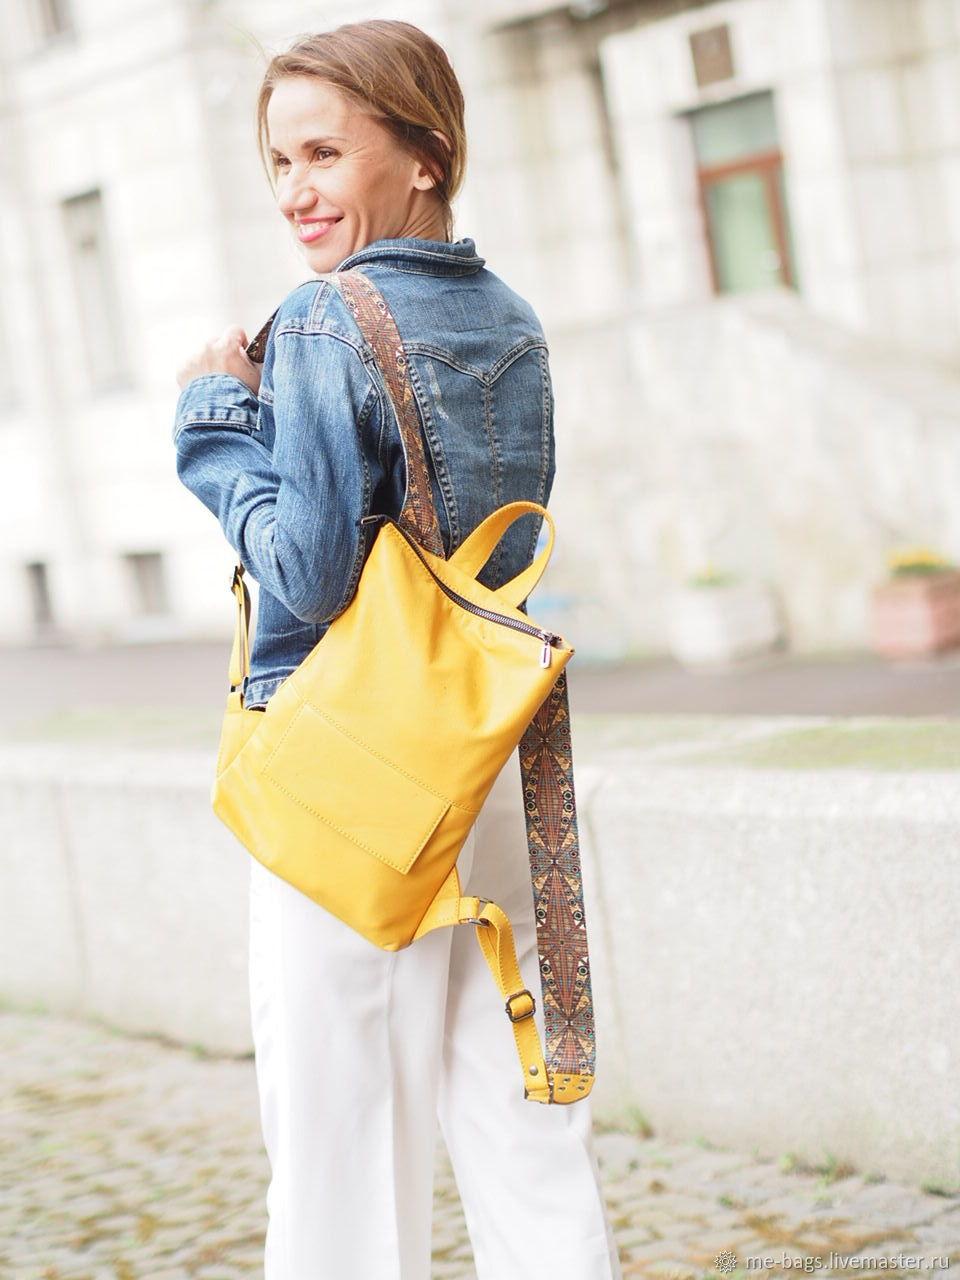 Toledo mini.  Yellow backpack leather, Backpacks, St. Petersburg,  Фото №1